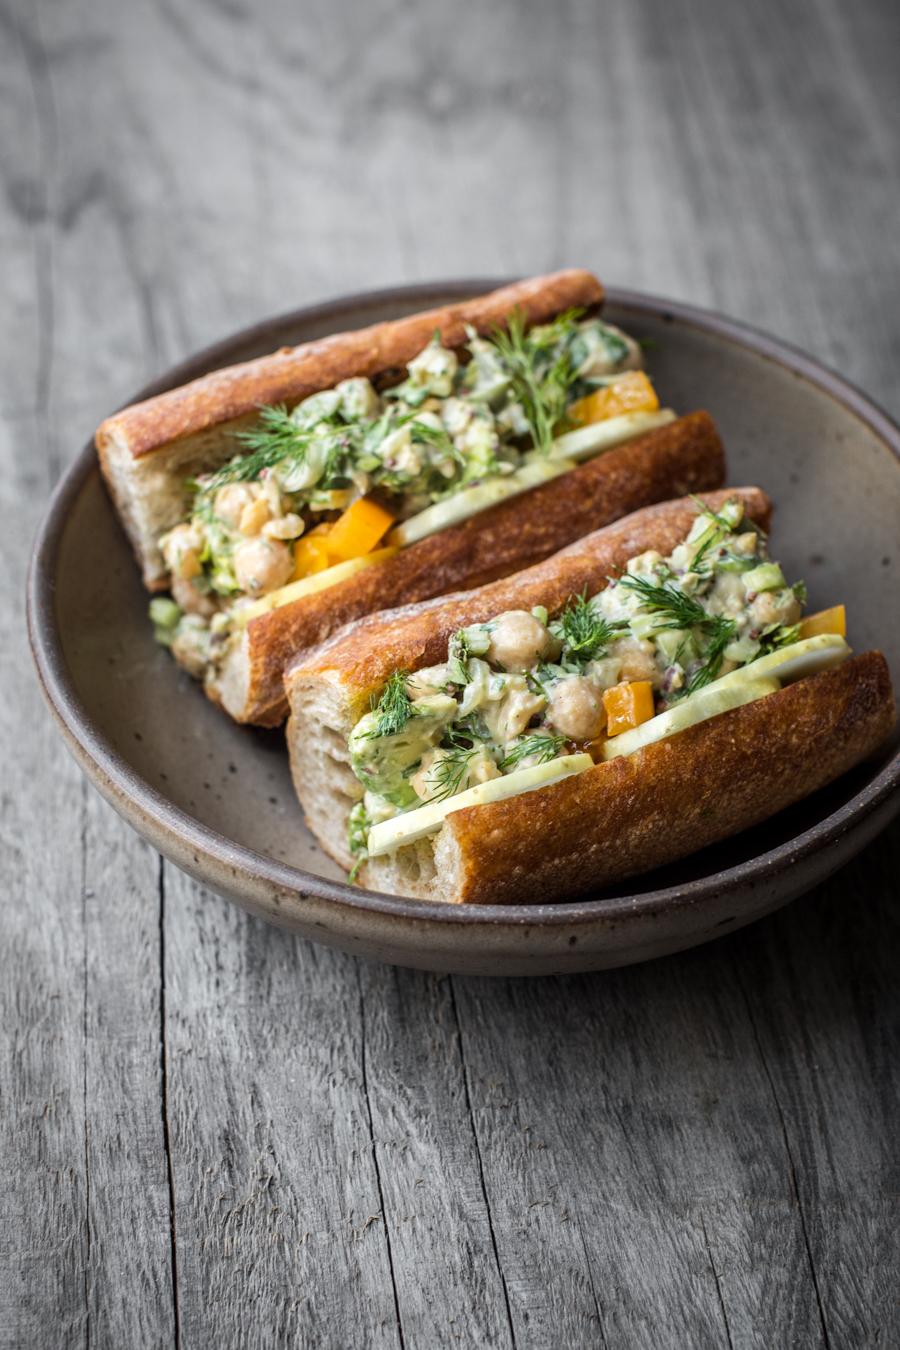 chickpea-avocado-salad-02.jpg